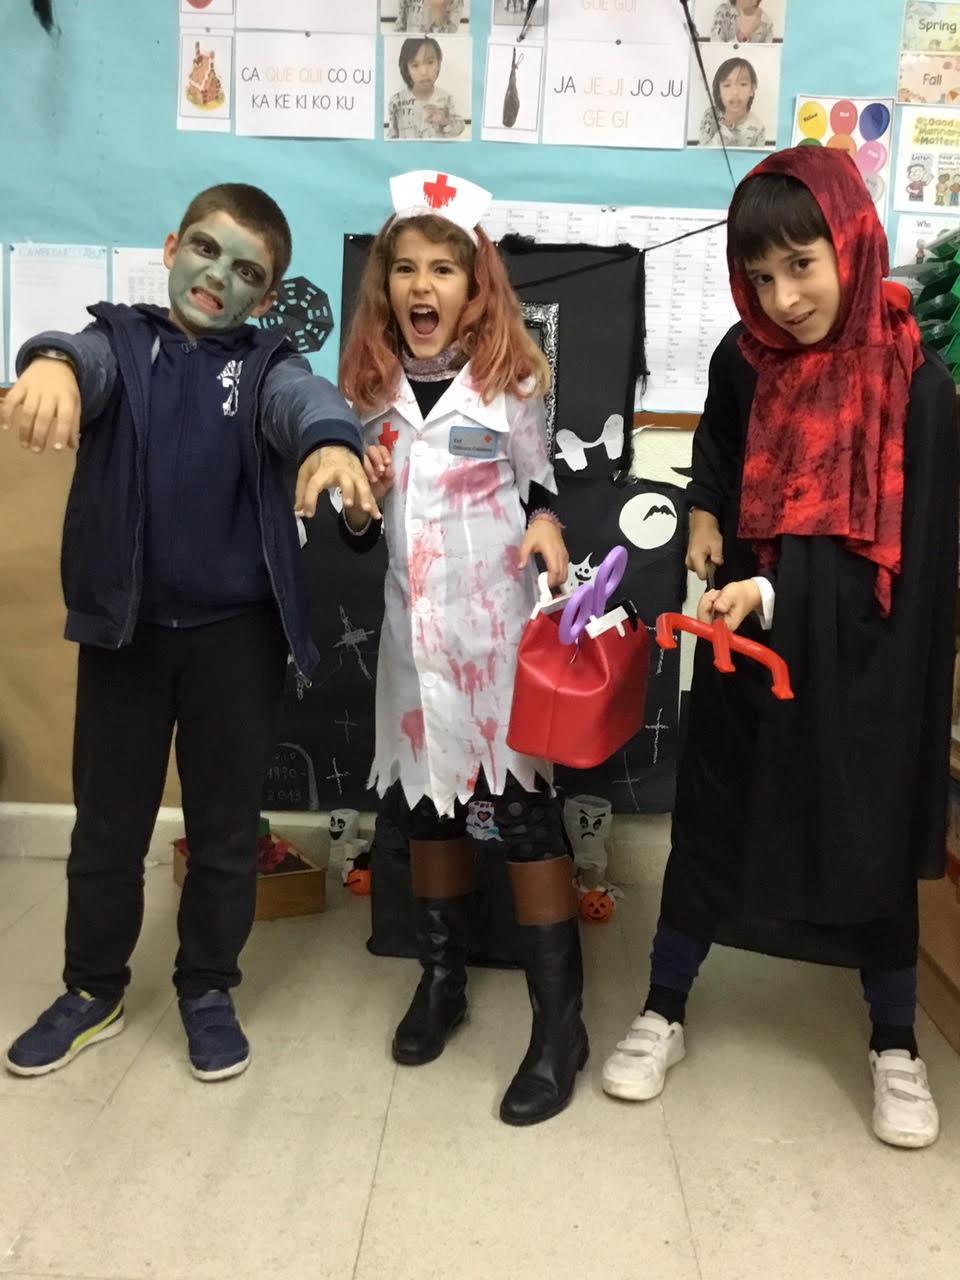 2018_10_31_Cuarto B disfruta en Halloween_CEIP FDLR_Las Rozas 1